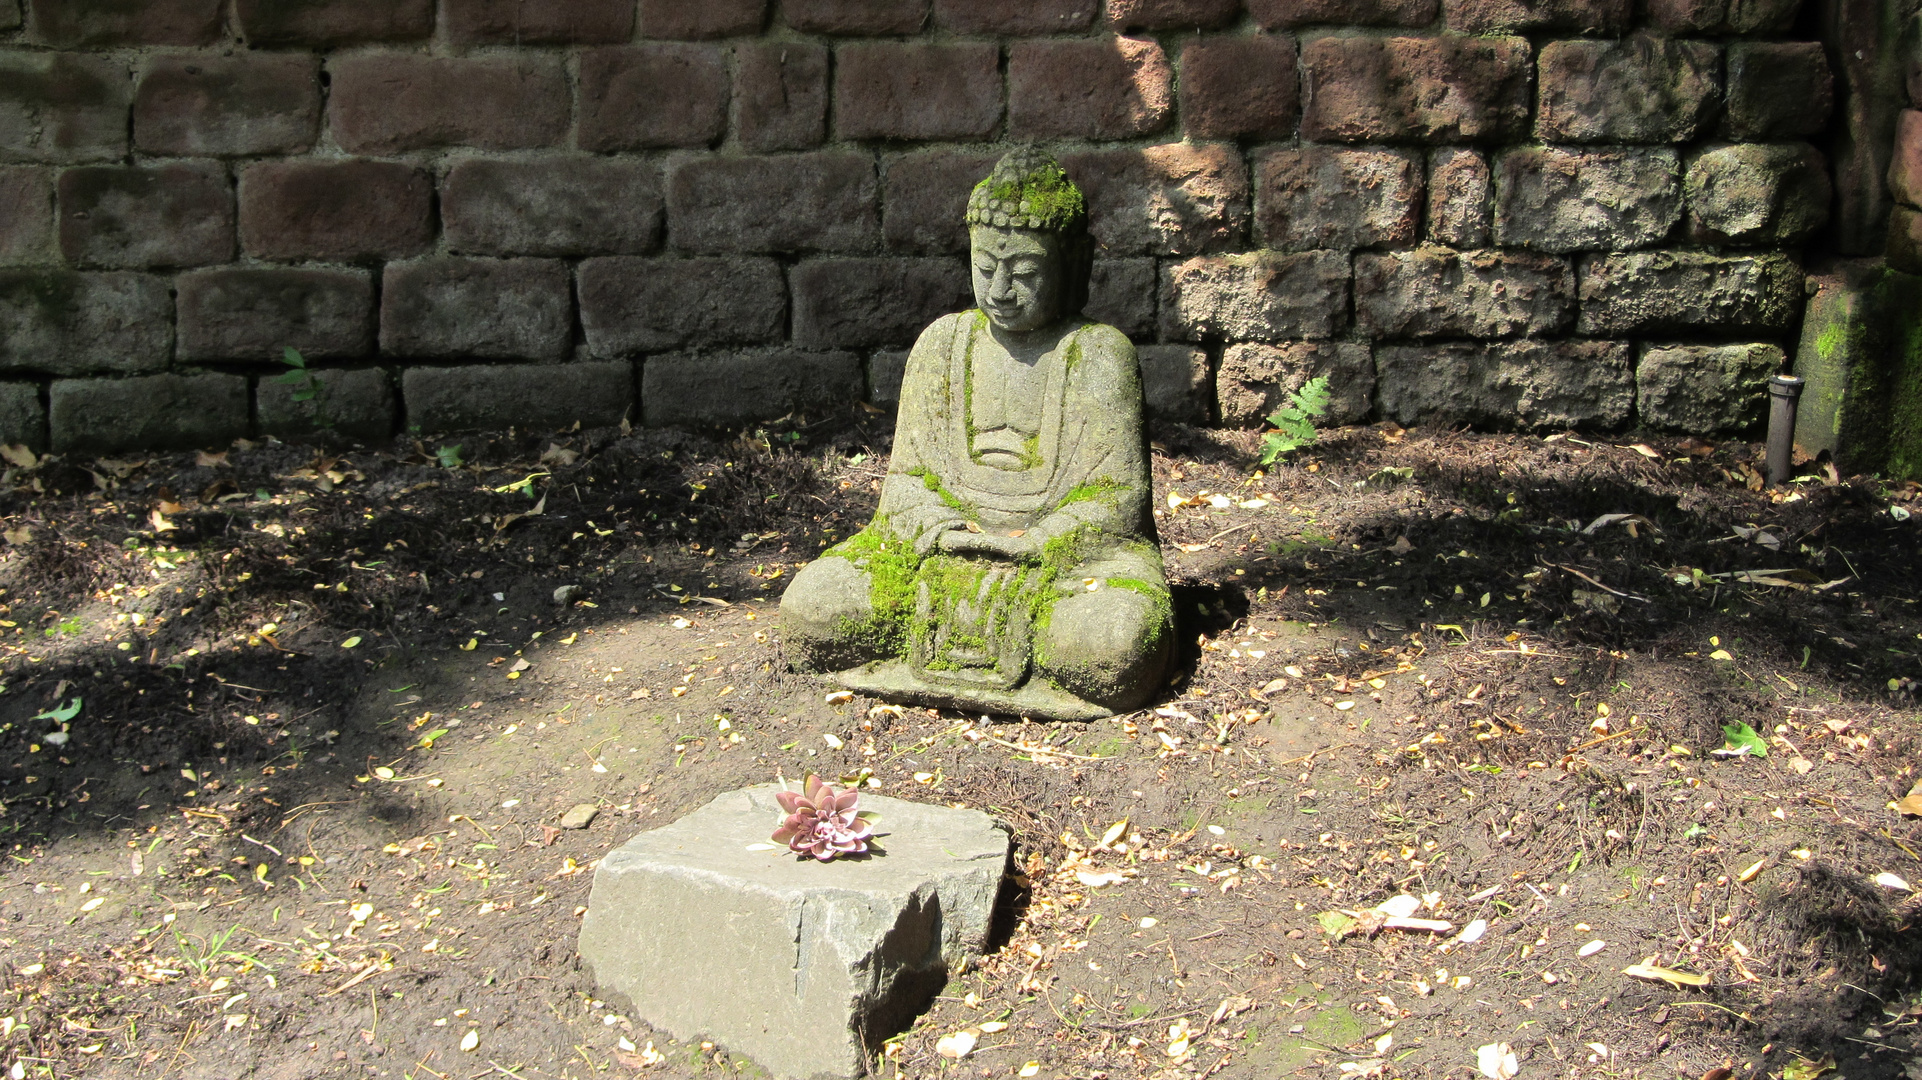 Buddha - Ruhe In Frieden